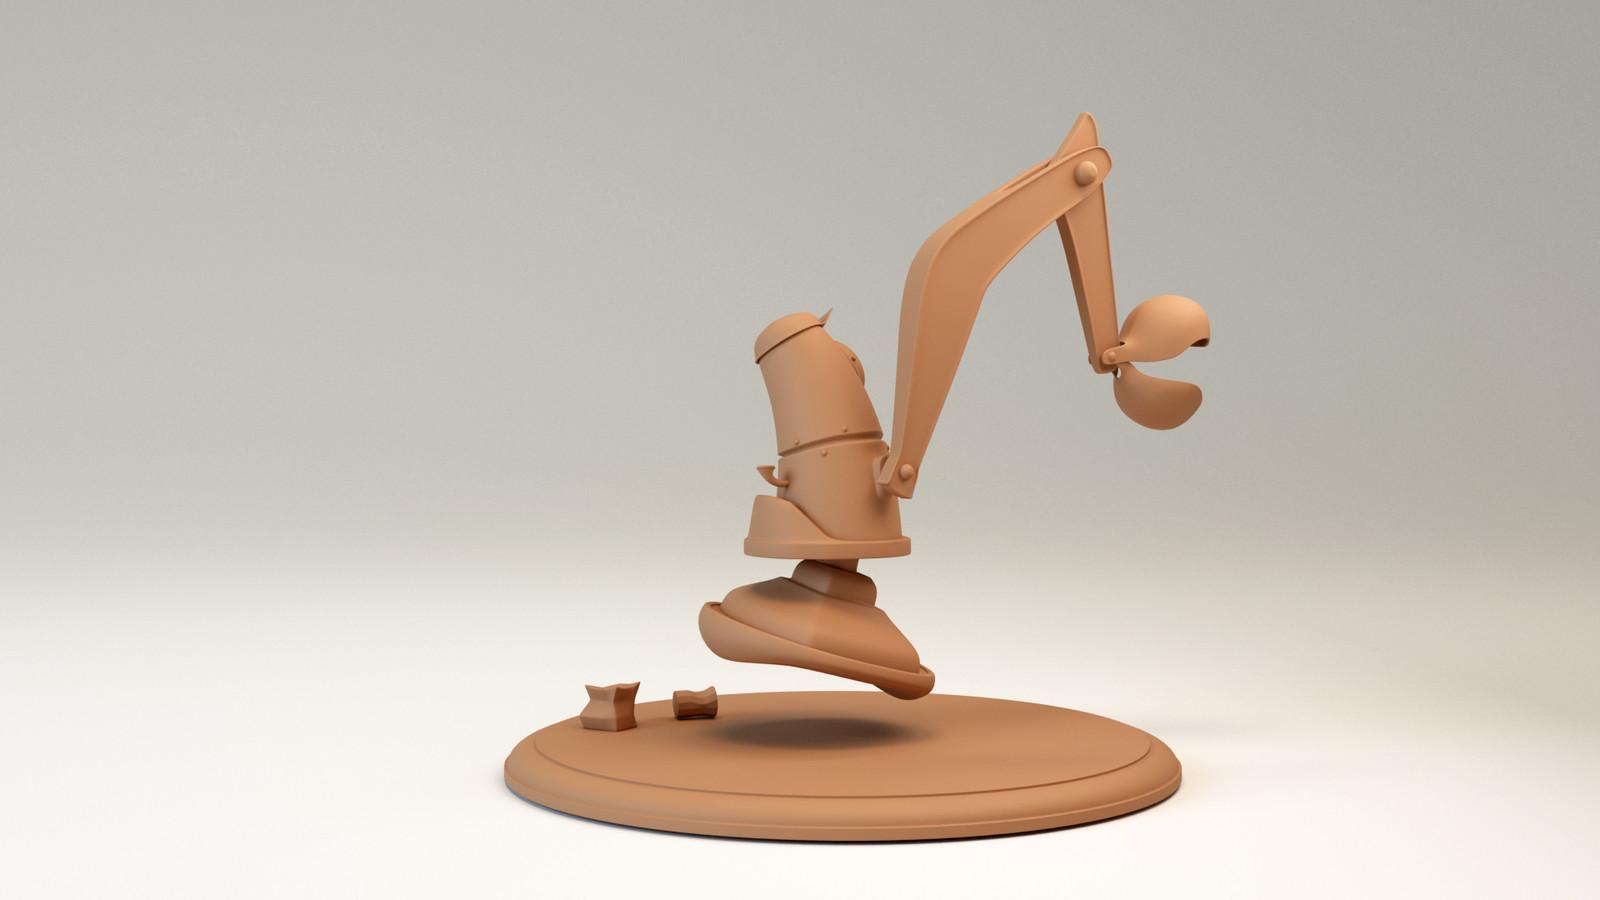 Rupert the Cleaner, sculpey render, back